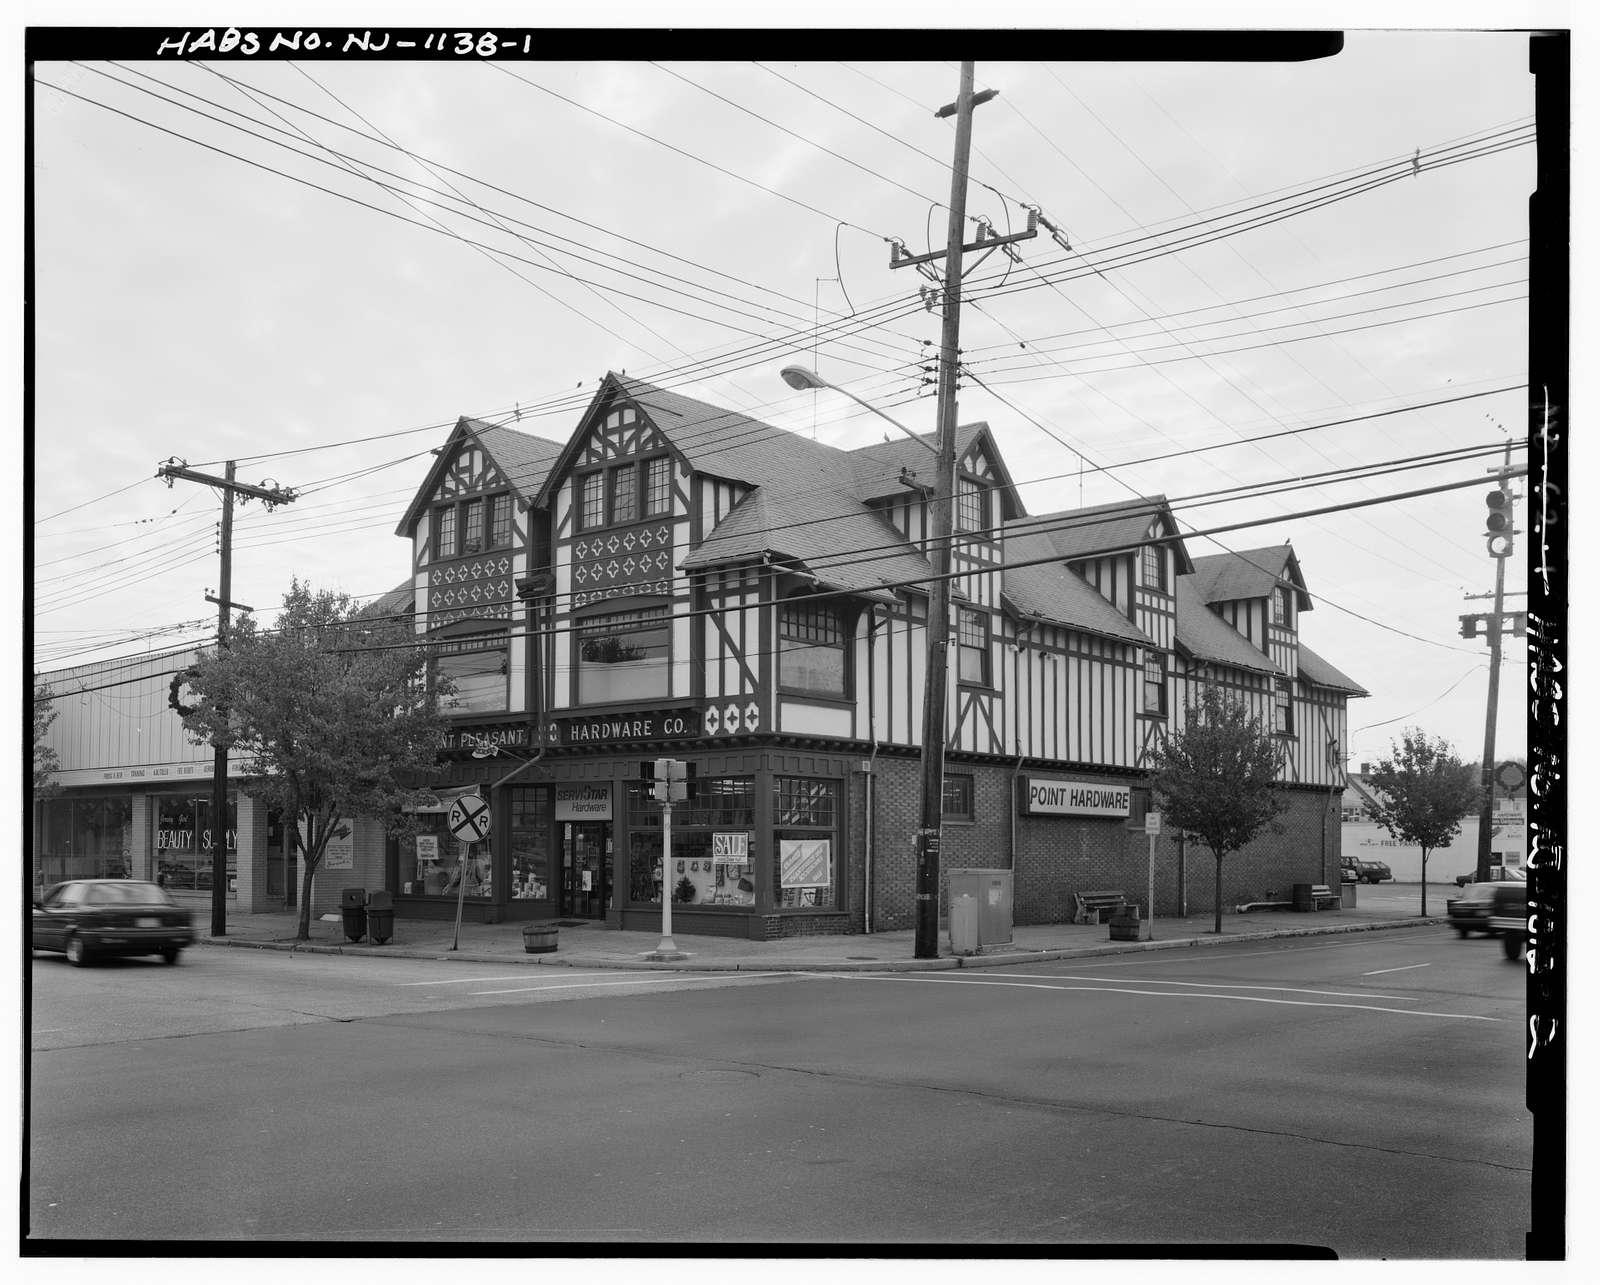 Point Pleasant Hardware Company, 528 Arnold Avenue, Point Pleasant, Ocean County, NJ